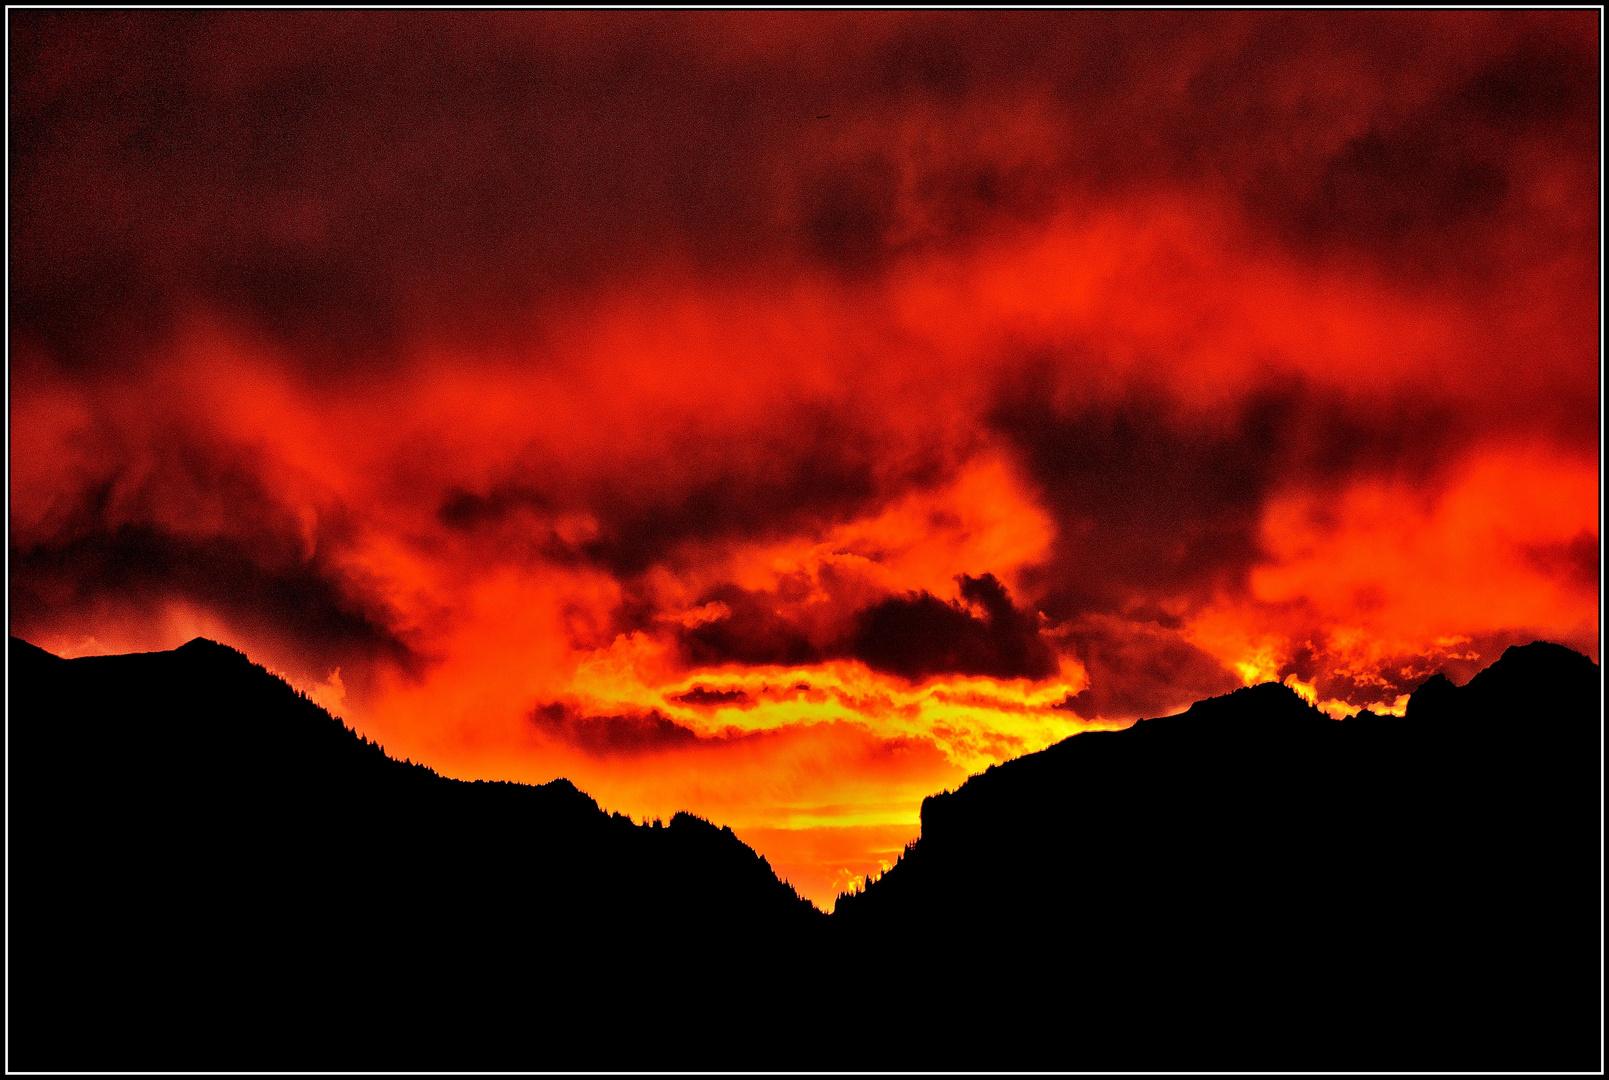 spektakulärer Sonnenaufgang...